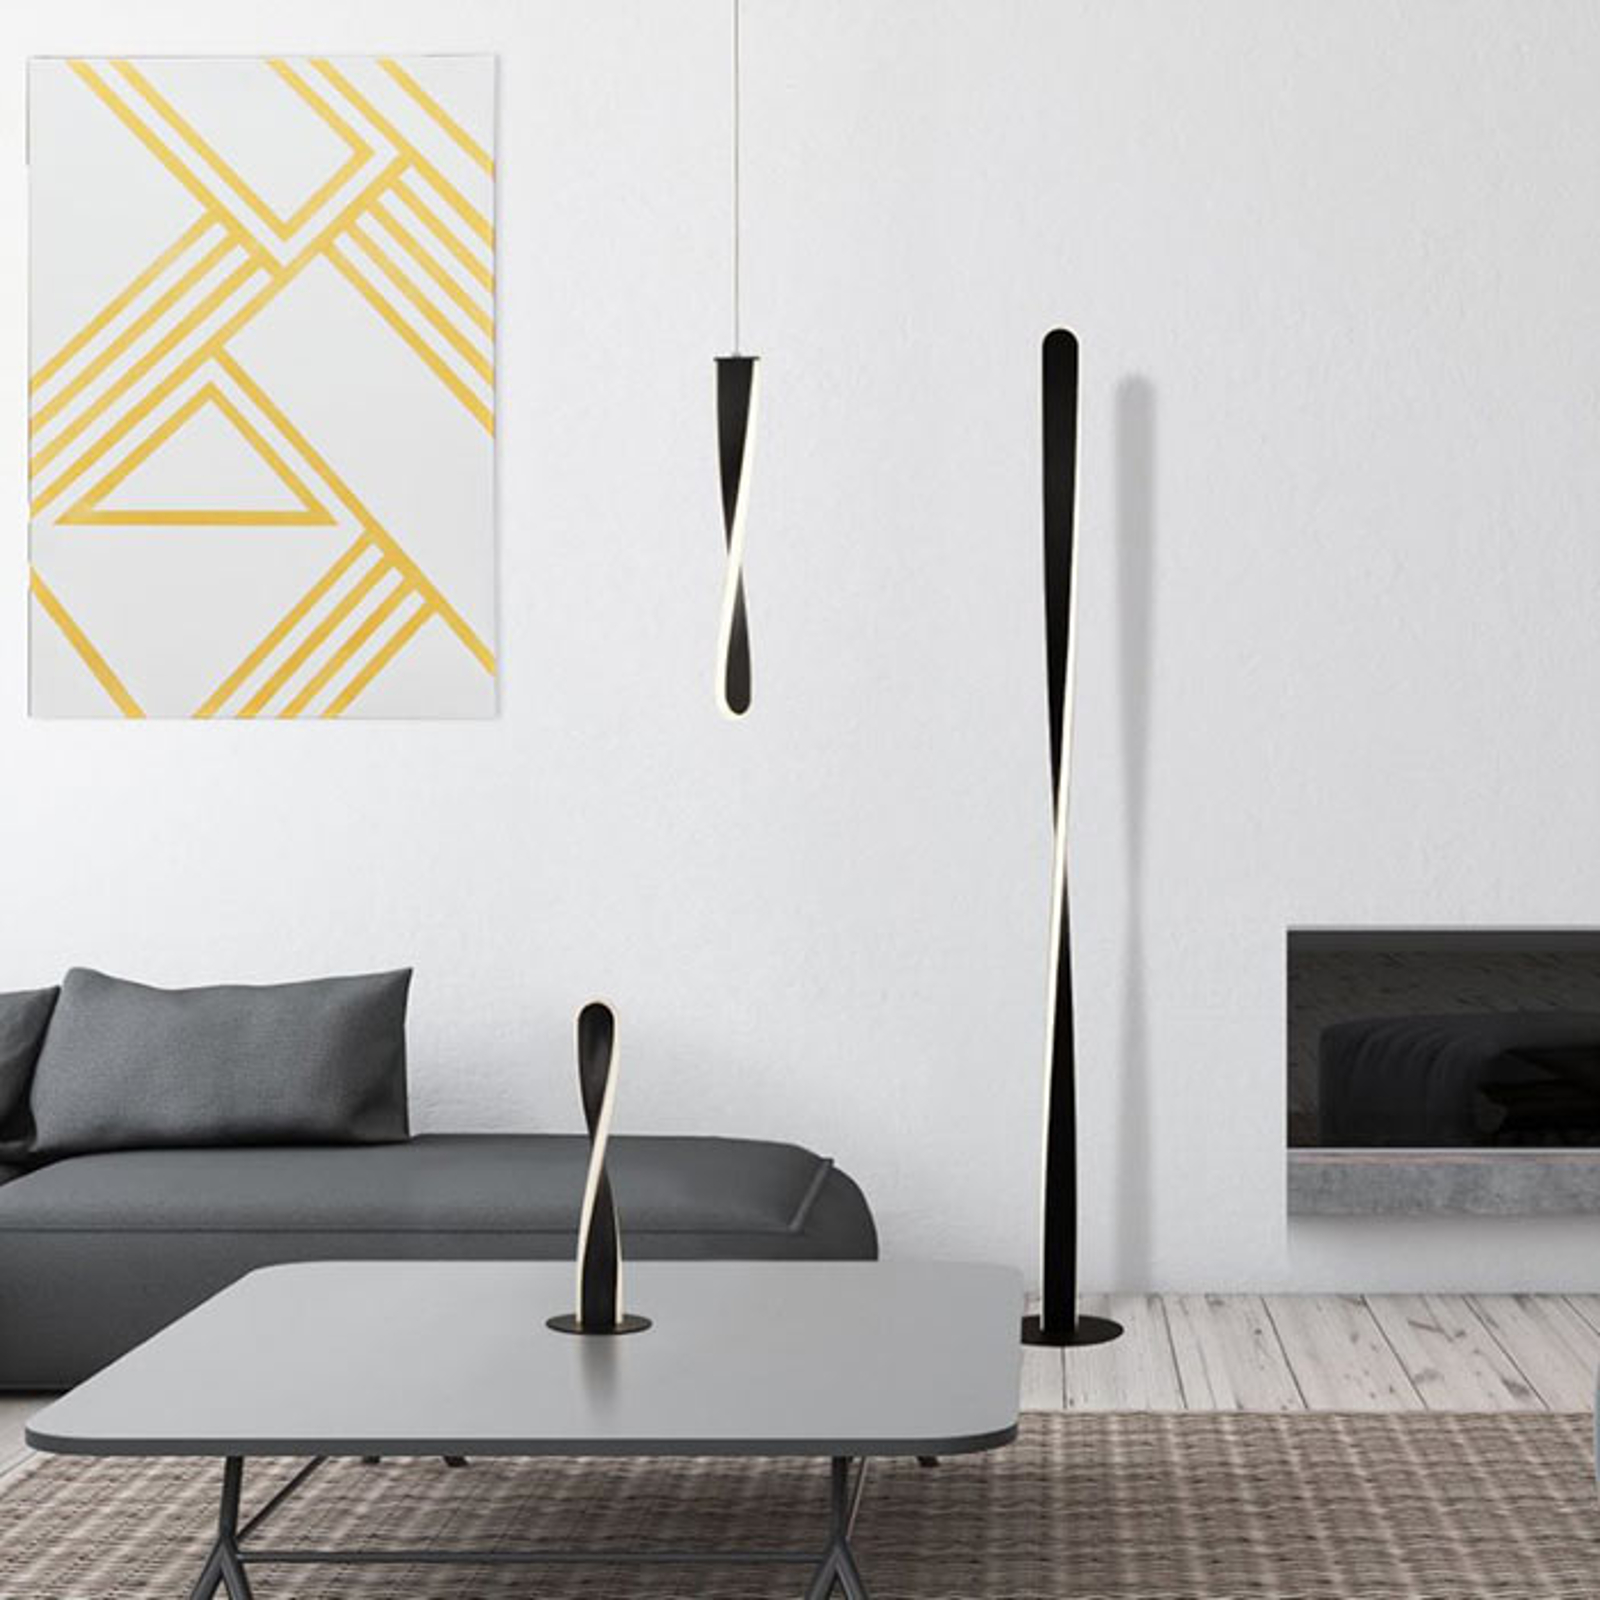 LED-Tischleuchte Paddle in gedrehter Form